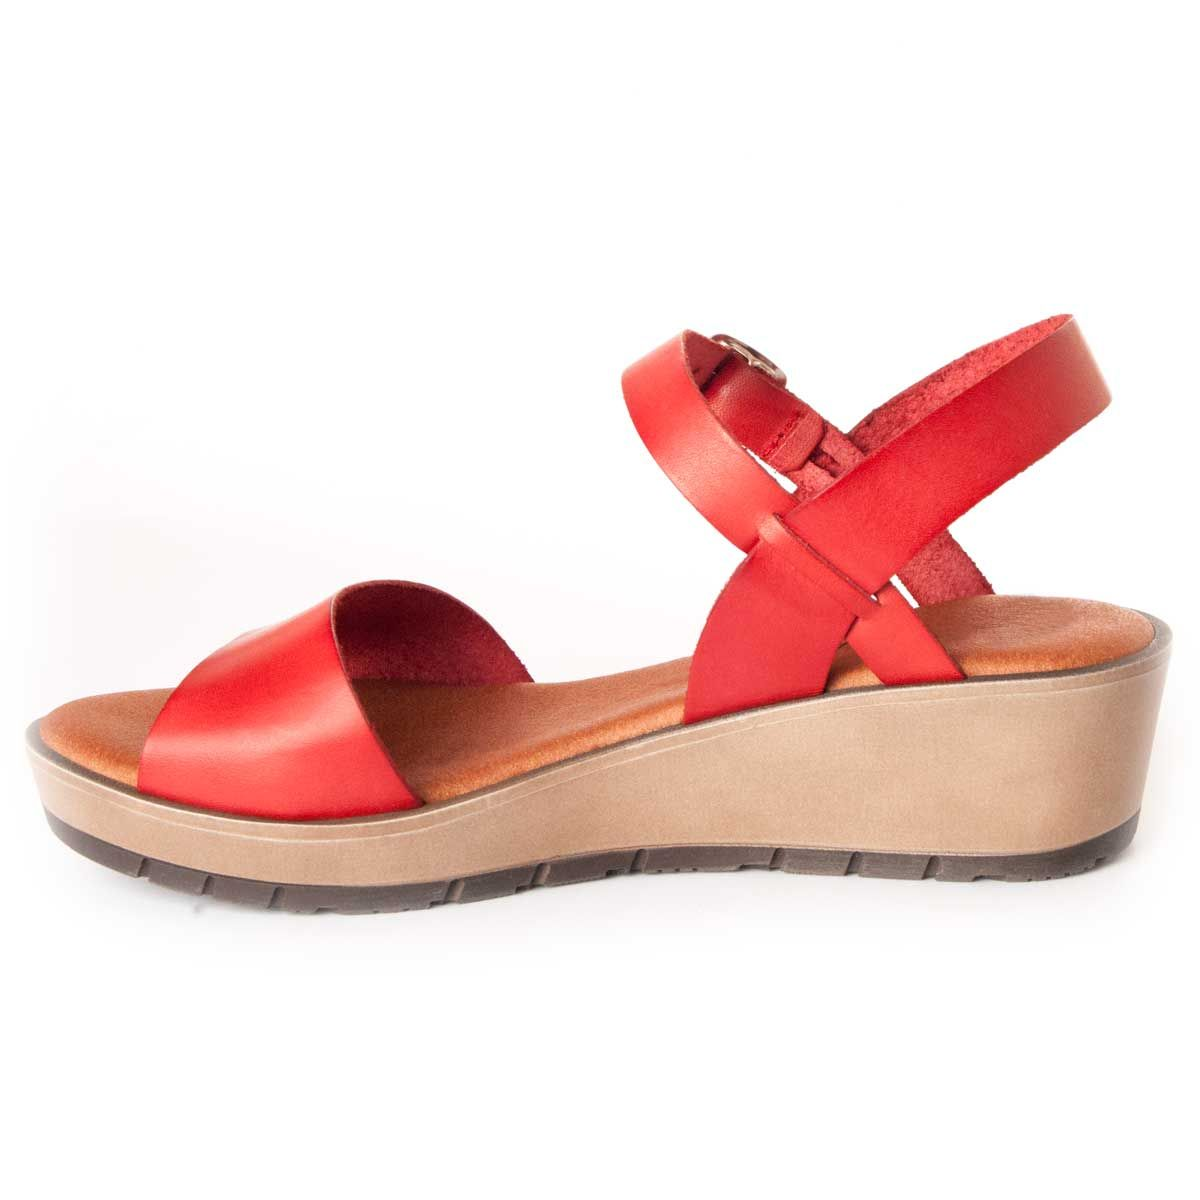 Purapiel Wedge Sandal in Red